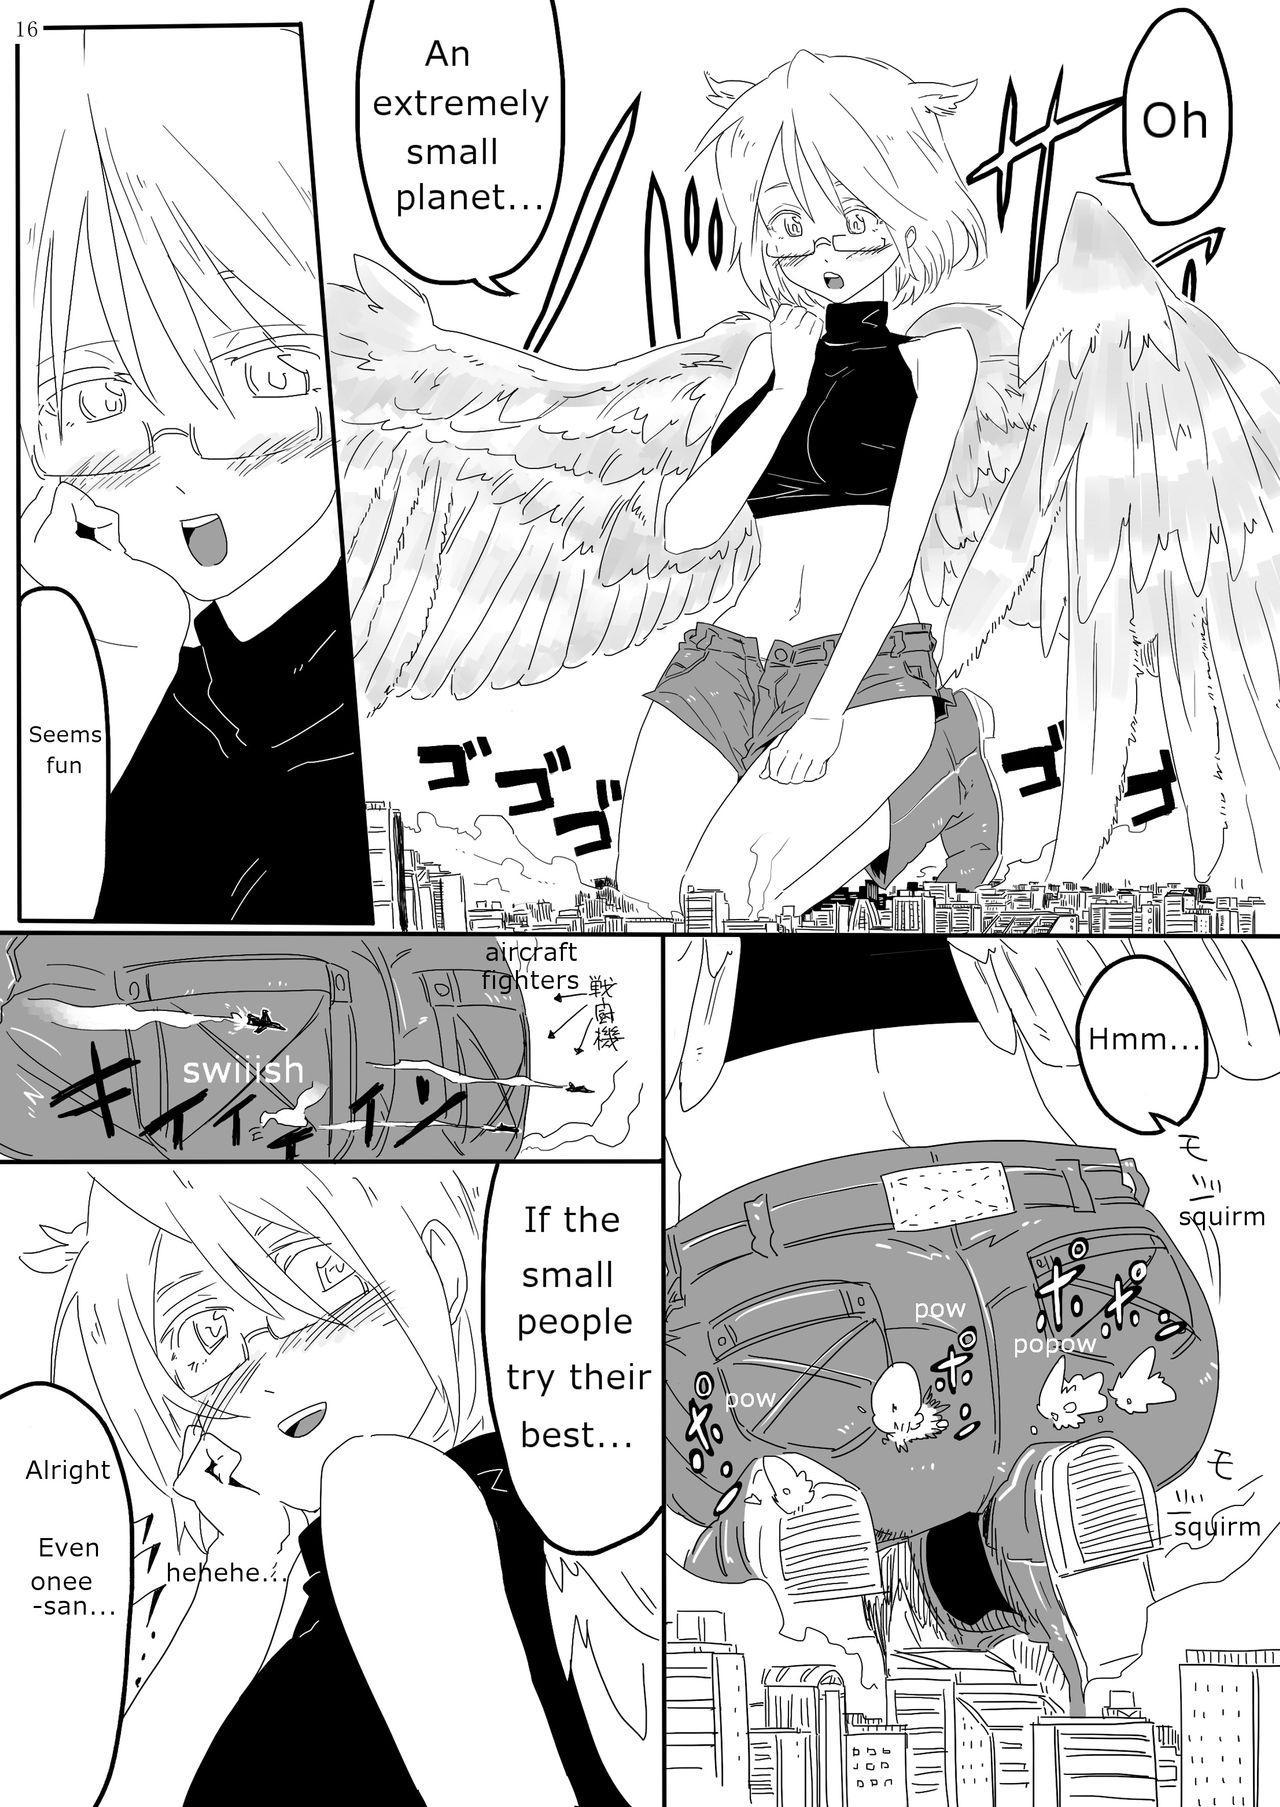 Bird girls stories 2